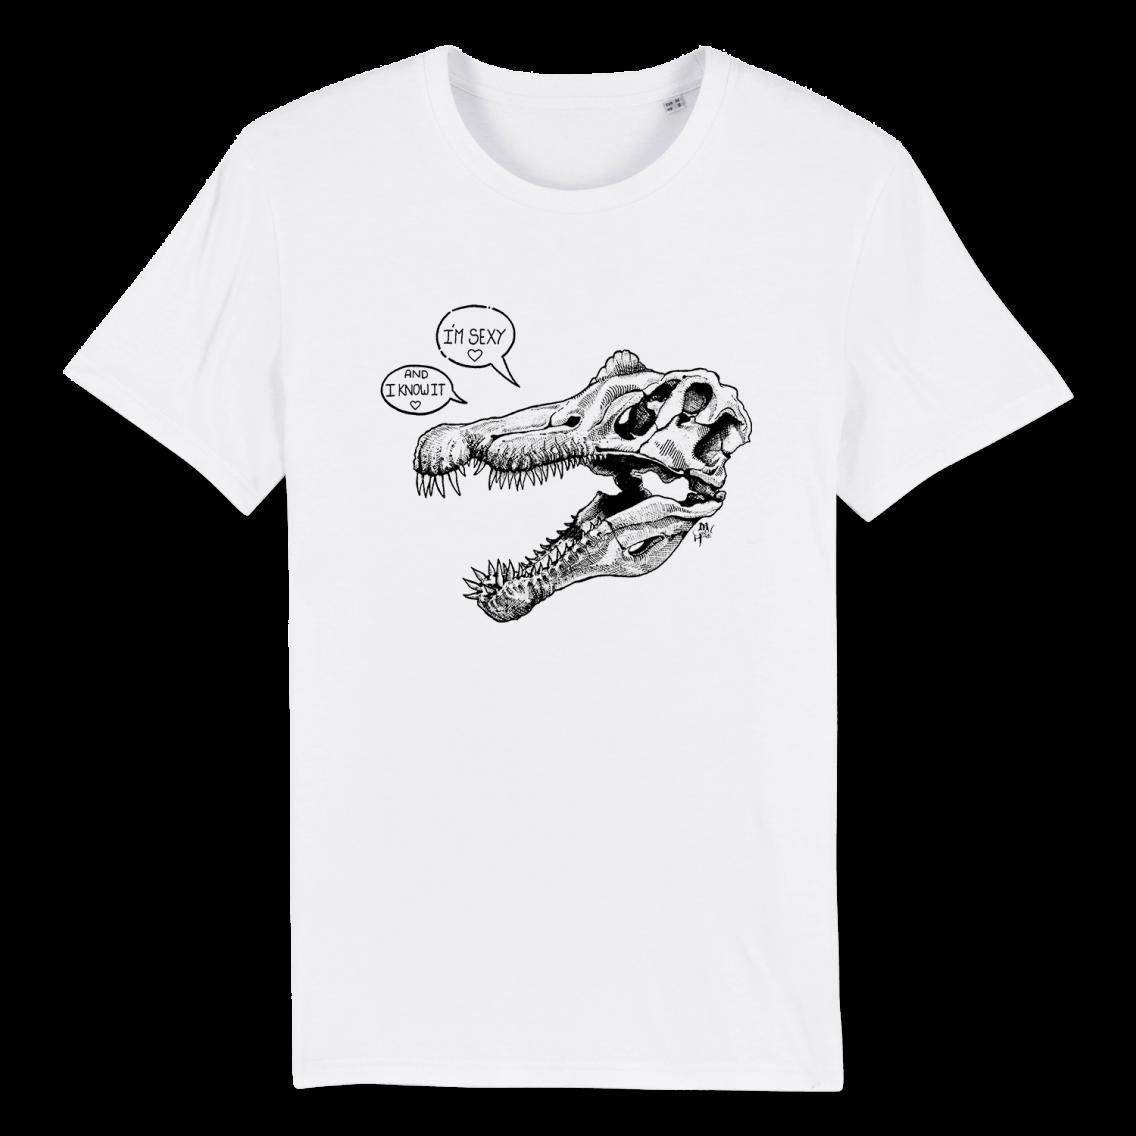 Mad'hands Tshirt - Atelier du Quai